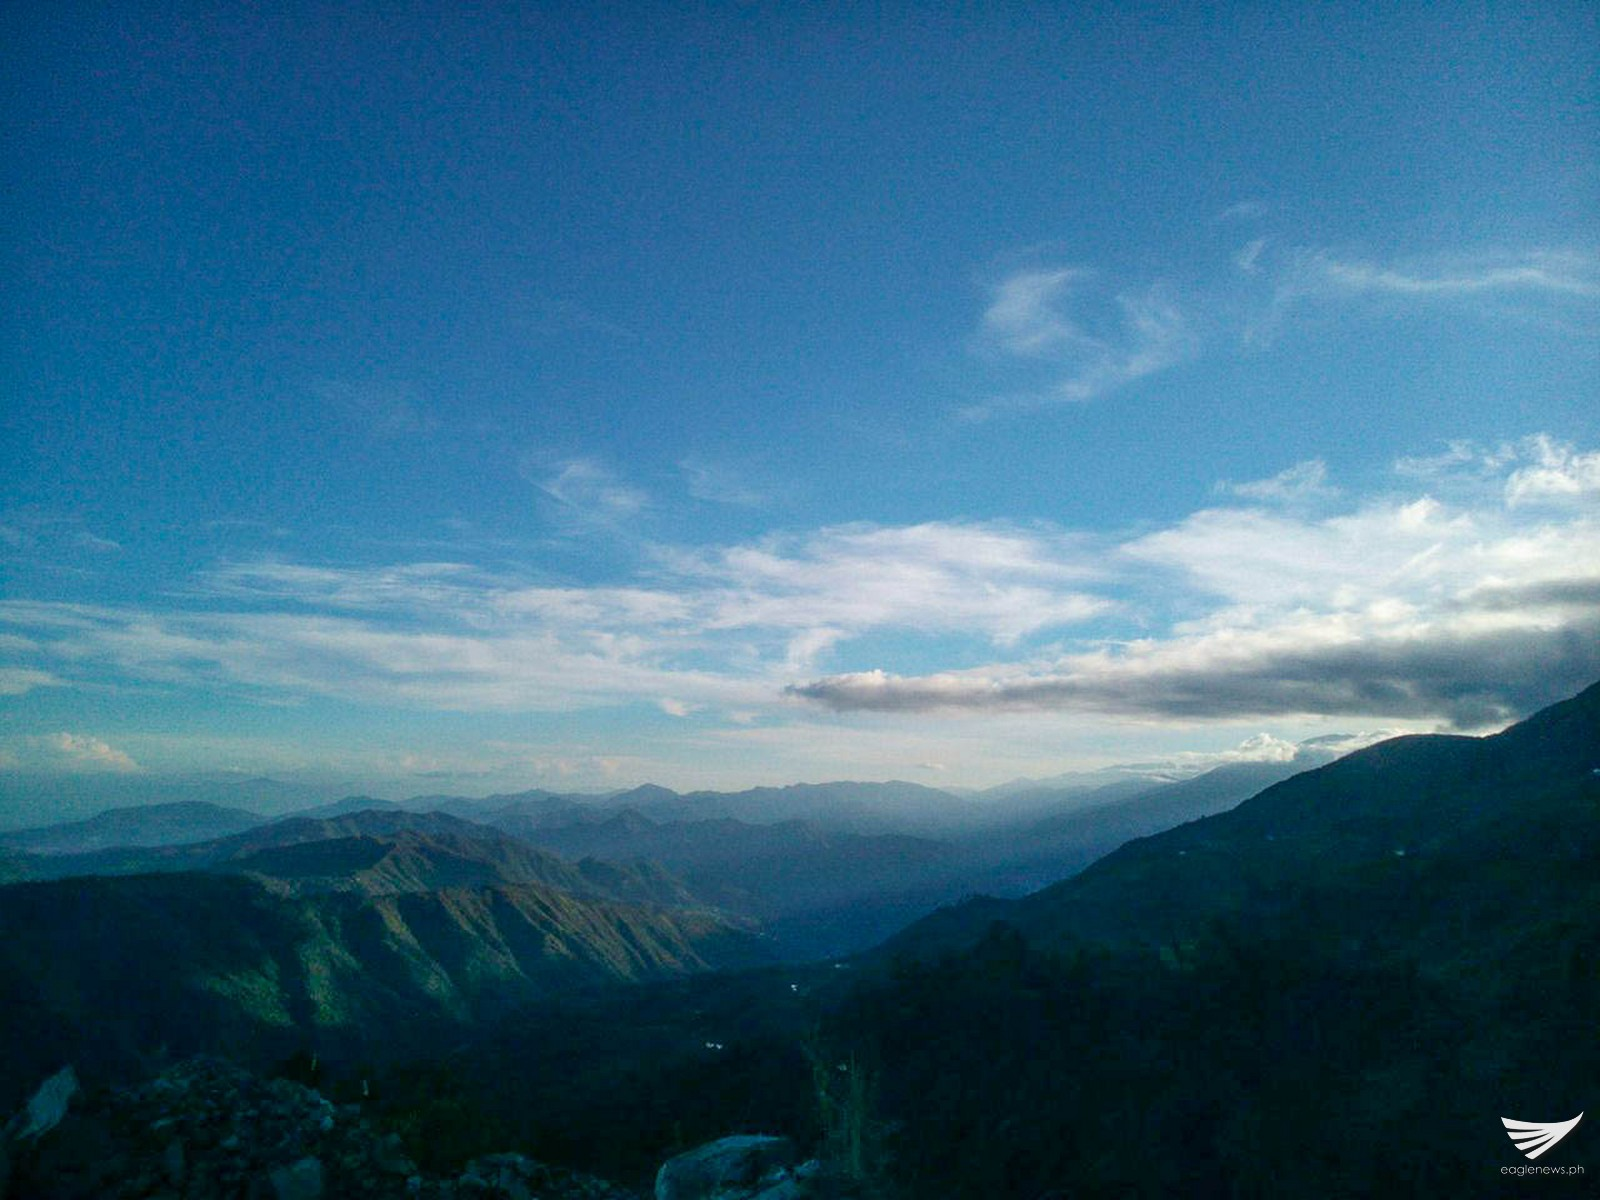 bontoc-mountain-province002